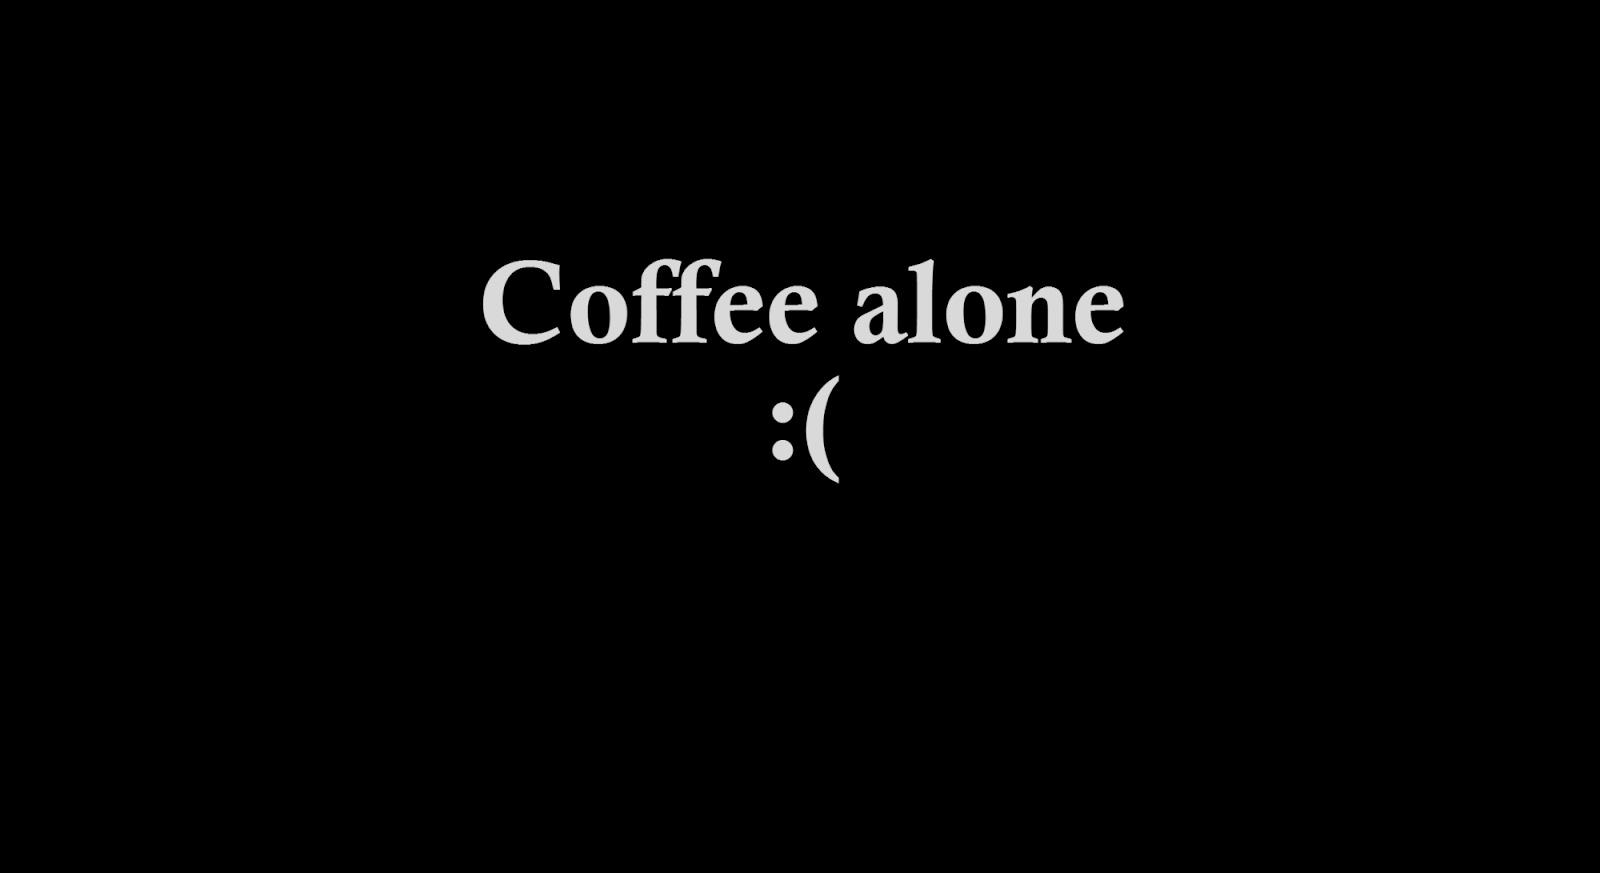 Coffee alone